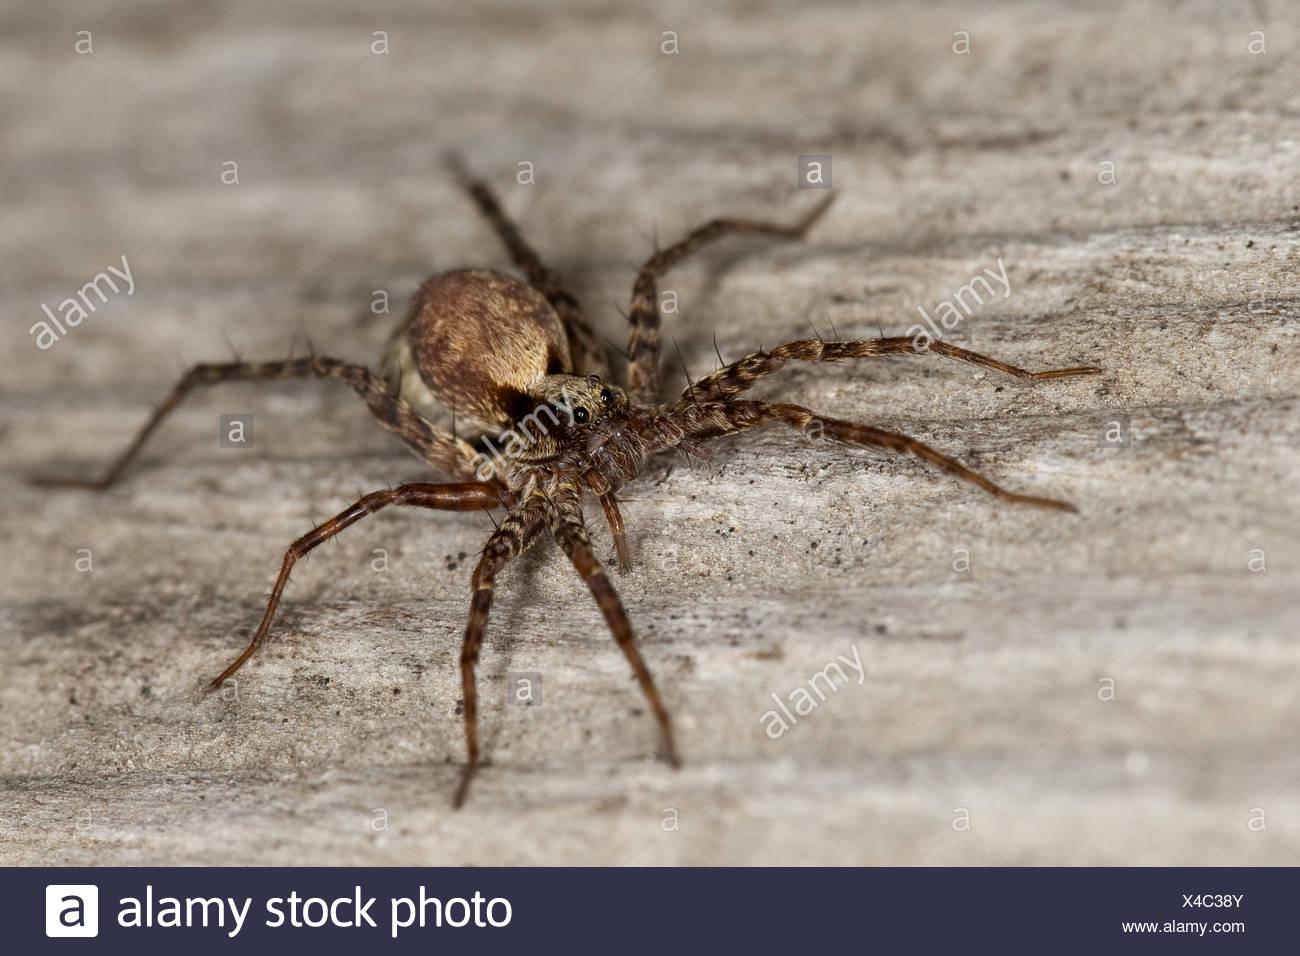 wolf spider, ground spider (Pardosa spec.), female carrying cocoon at the abdomen, Pardosa lugubris s.l. - Stock Image